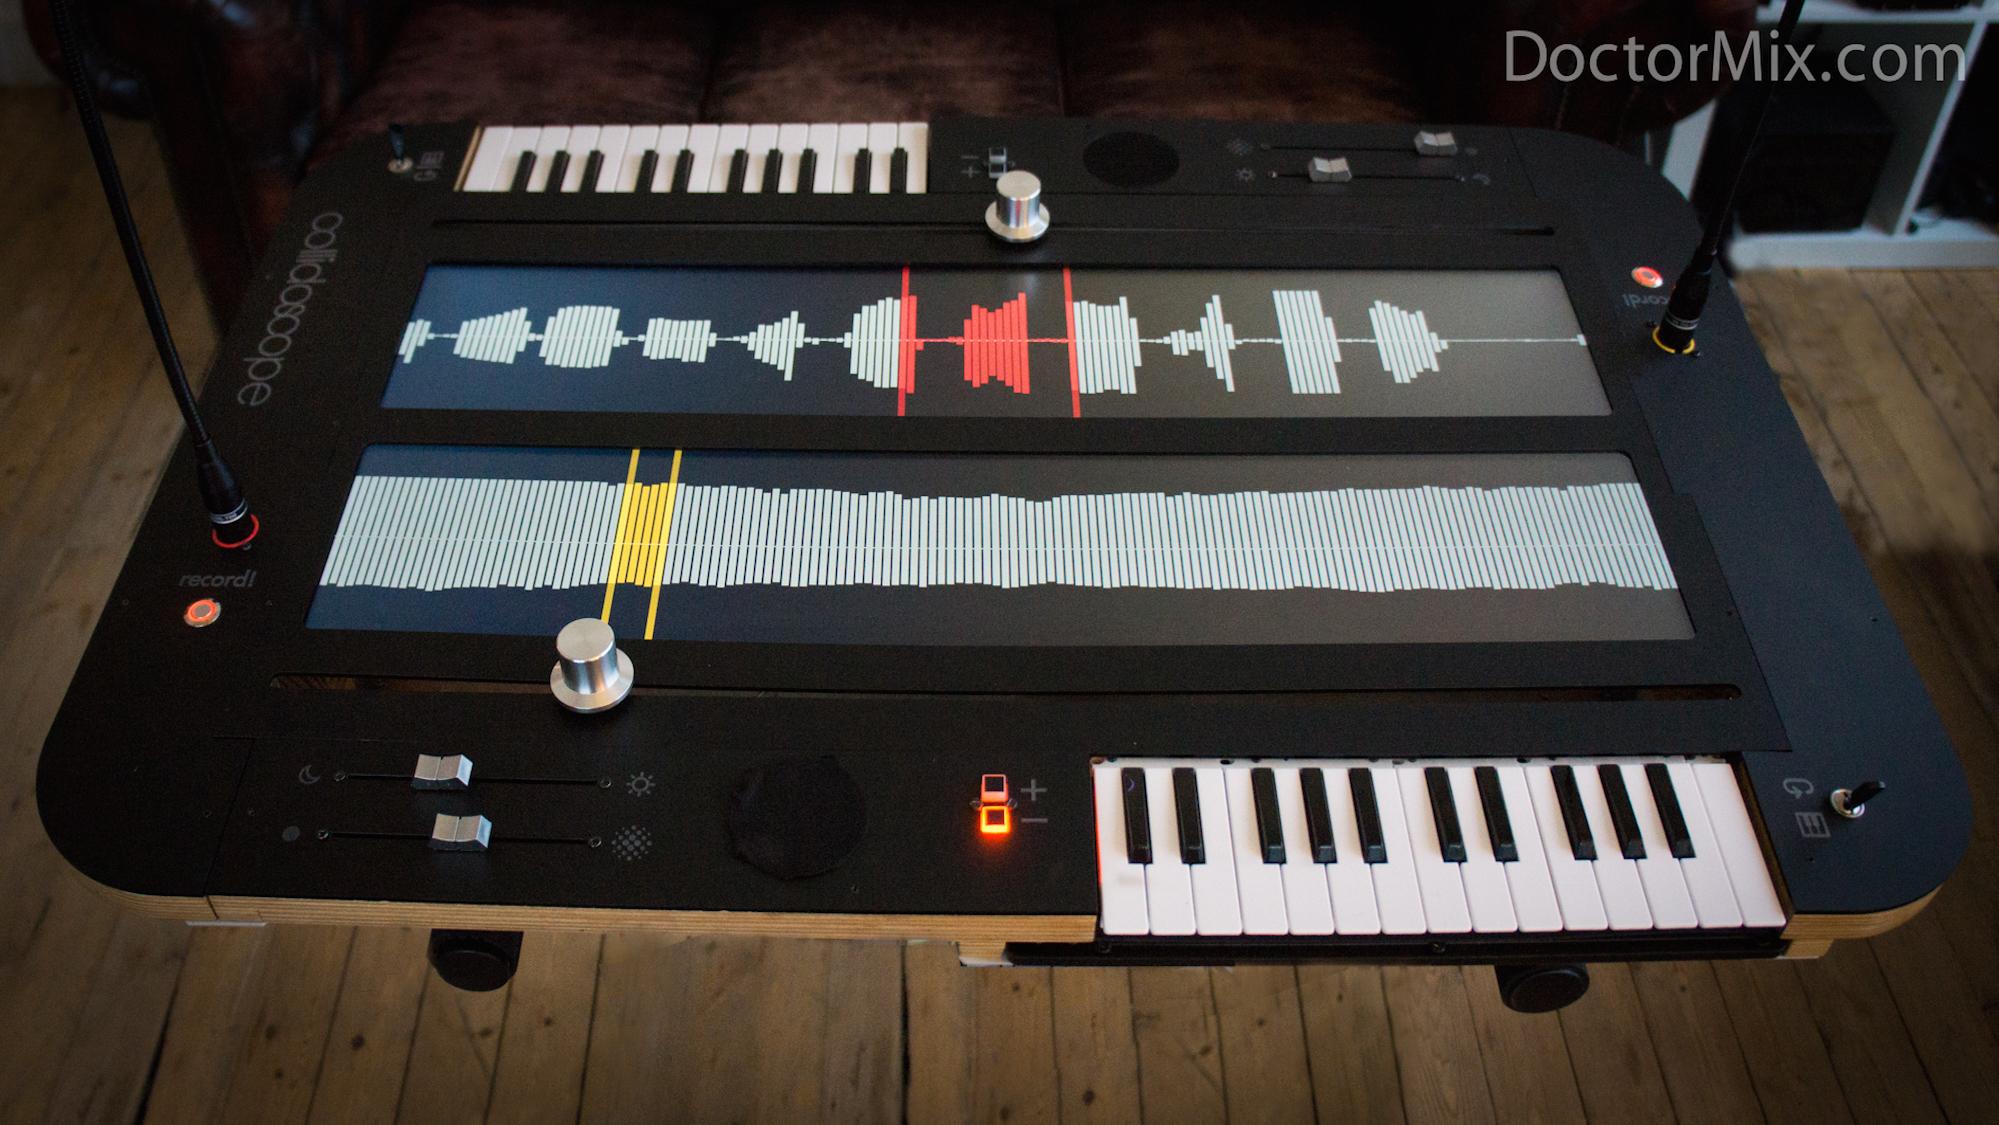 Collidoscope hybrid keyboard synth sampler